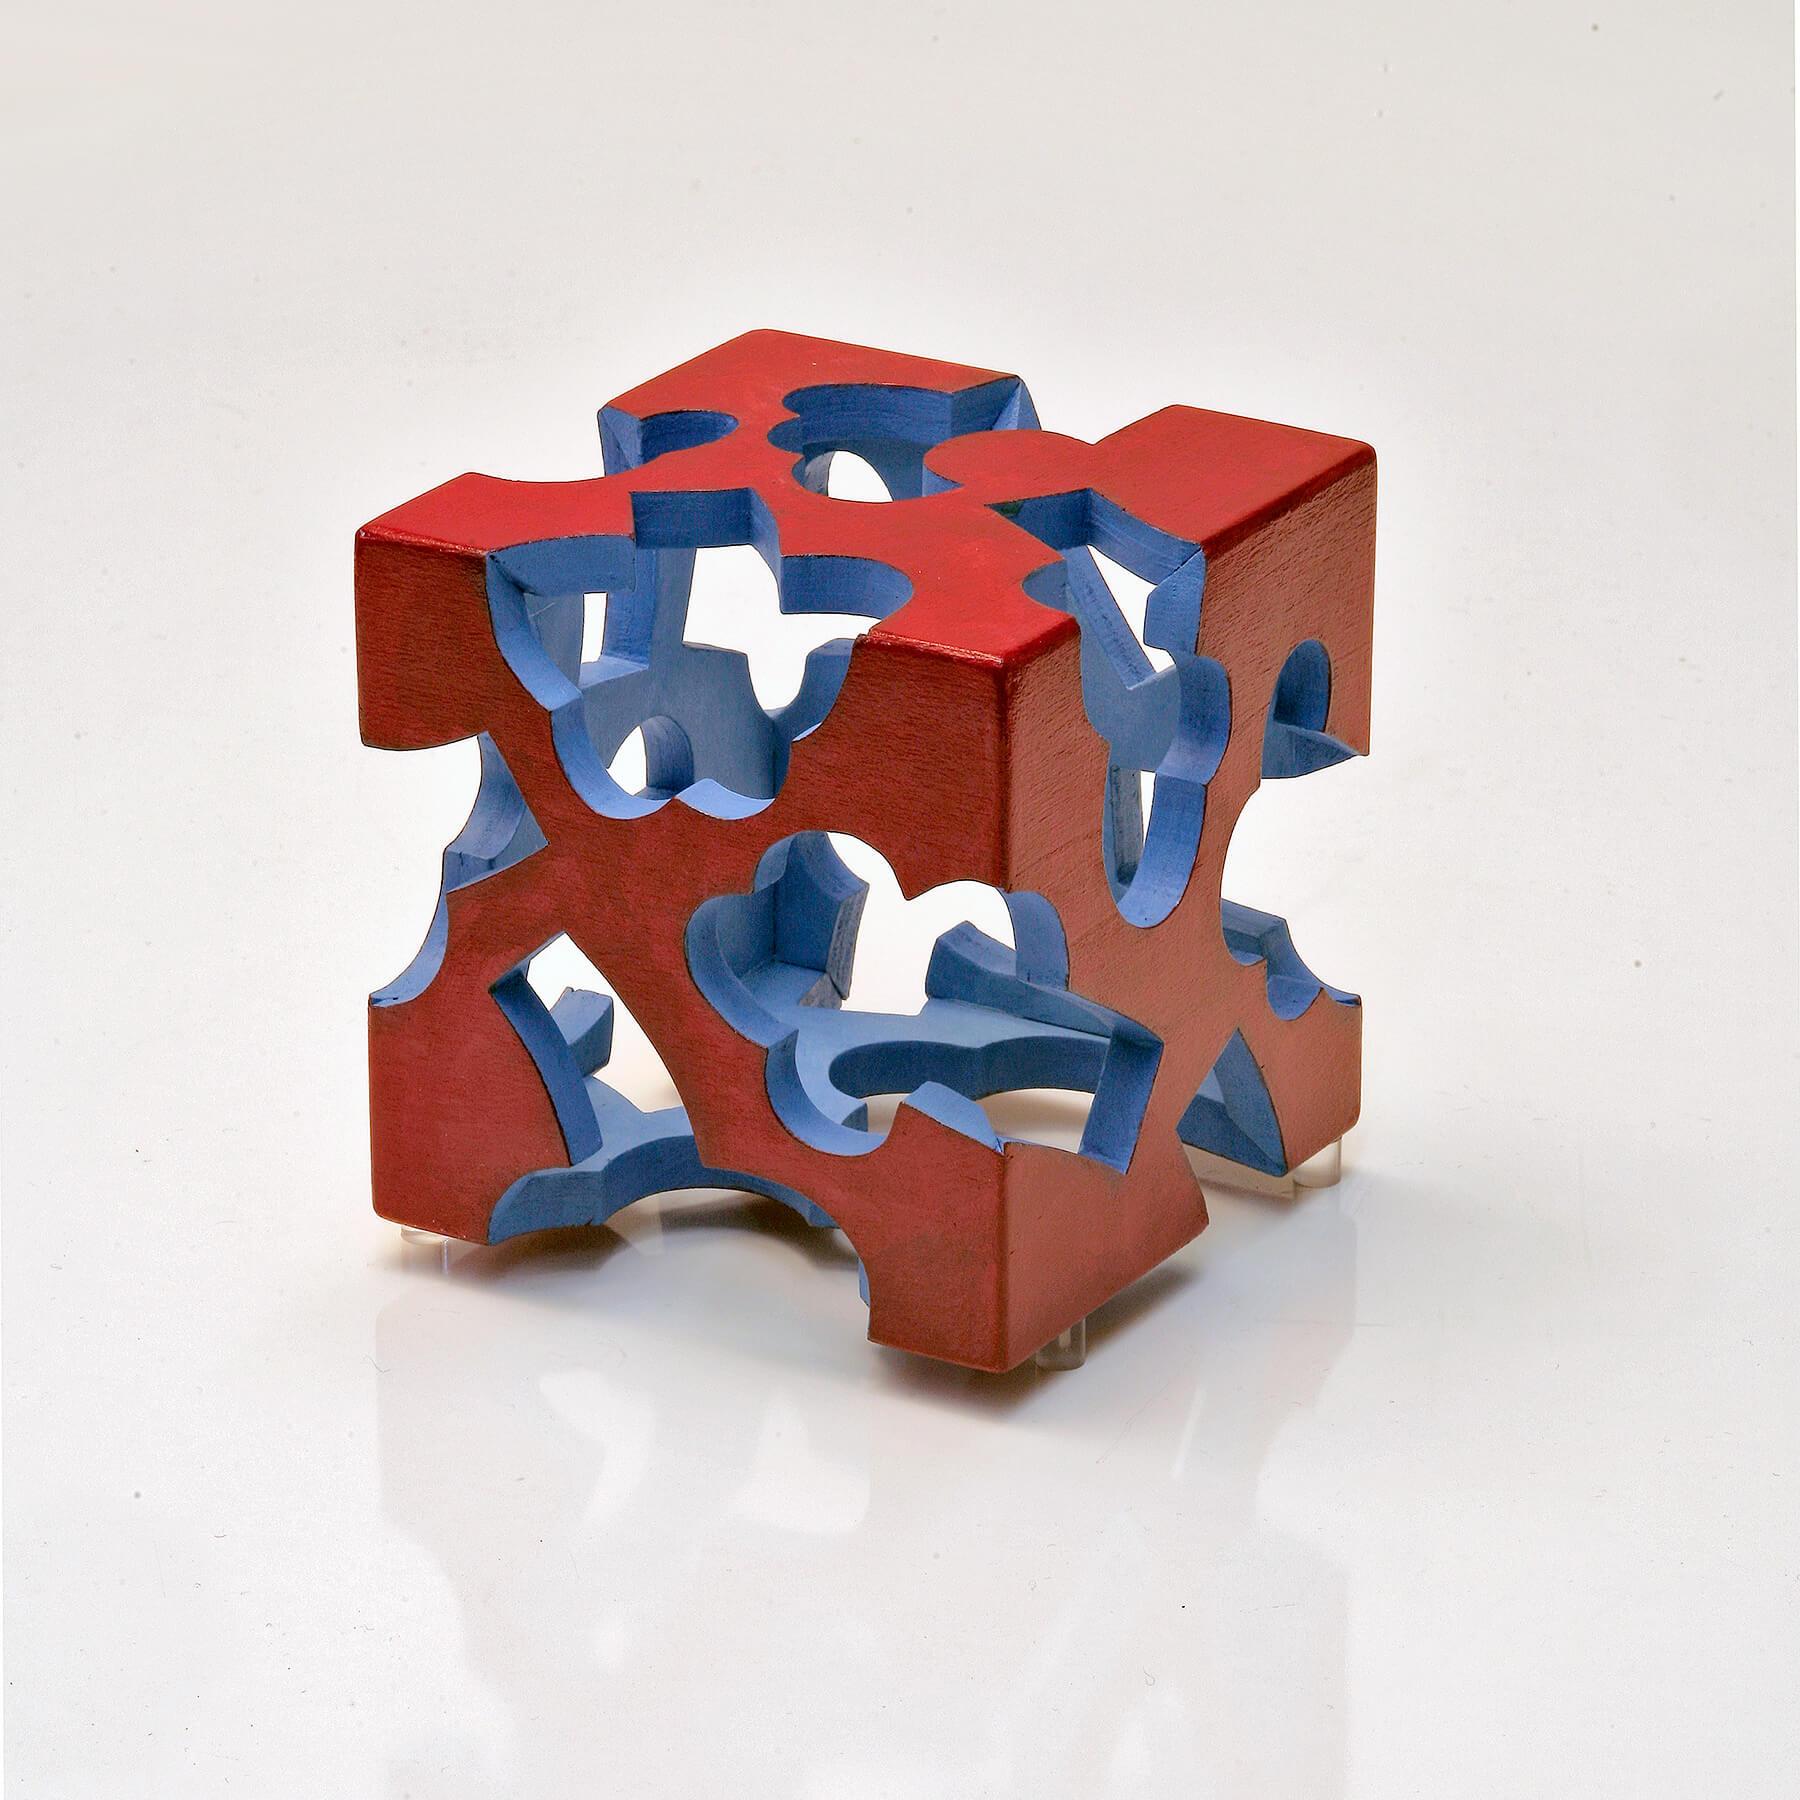 Barbara Jäger Skulpturen Außenrot Innenblau Holz Acryl